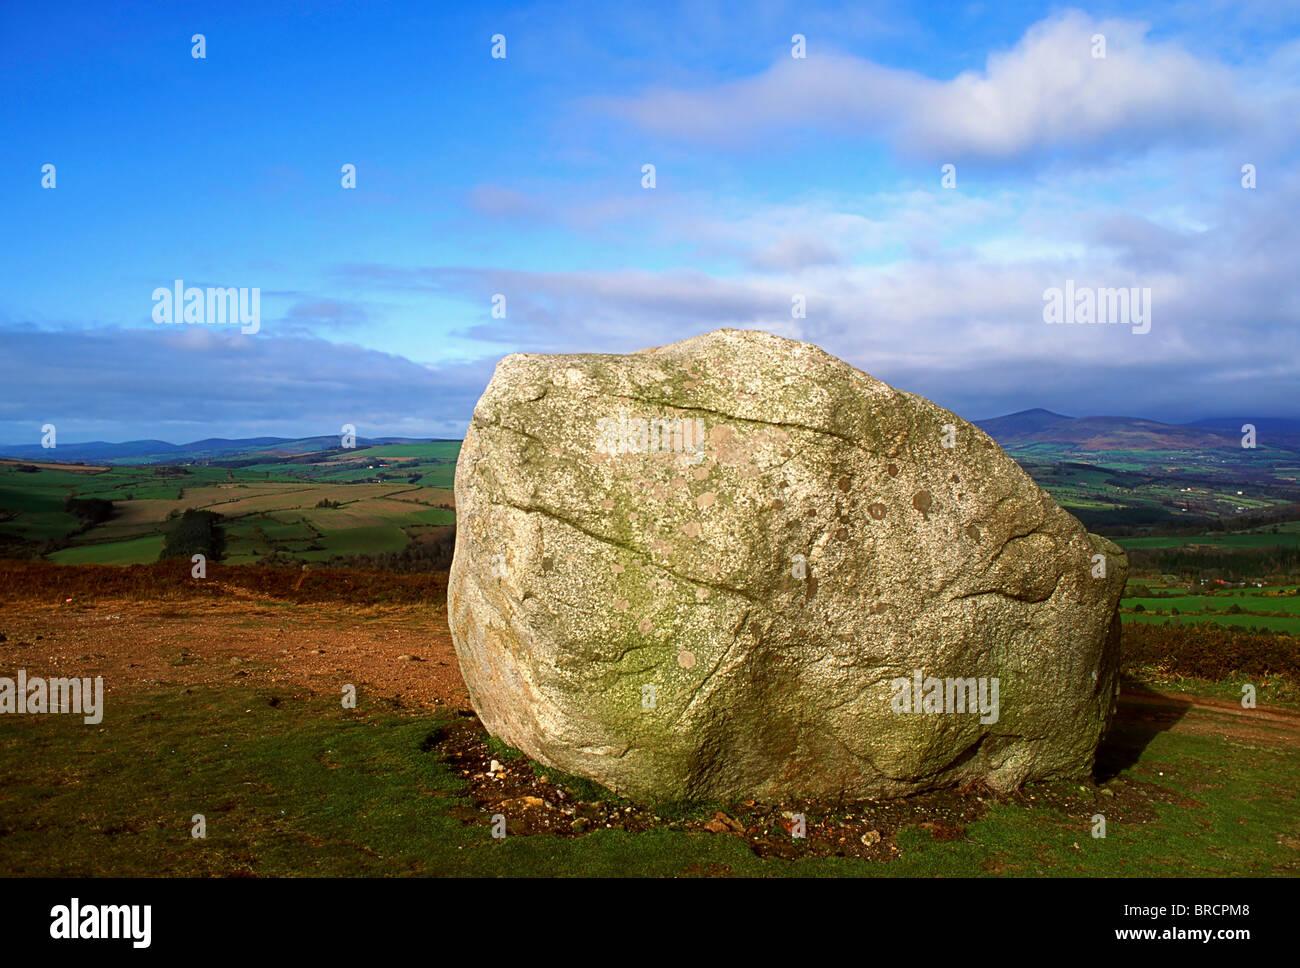 Motty Stone, Avoca, Co Wicklow, Ireland - Stock Image